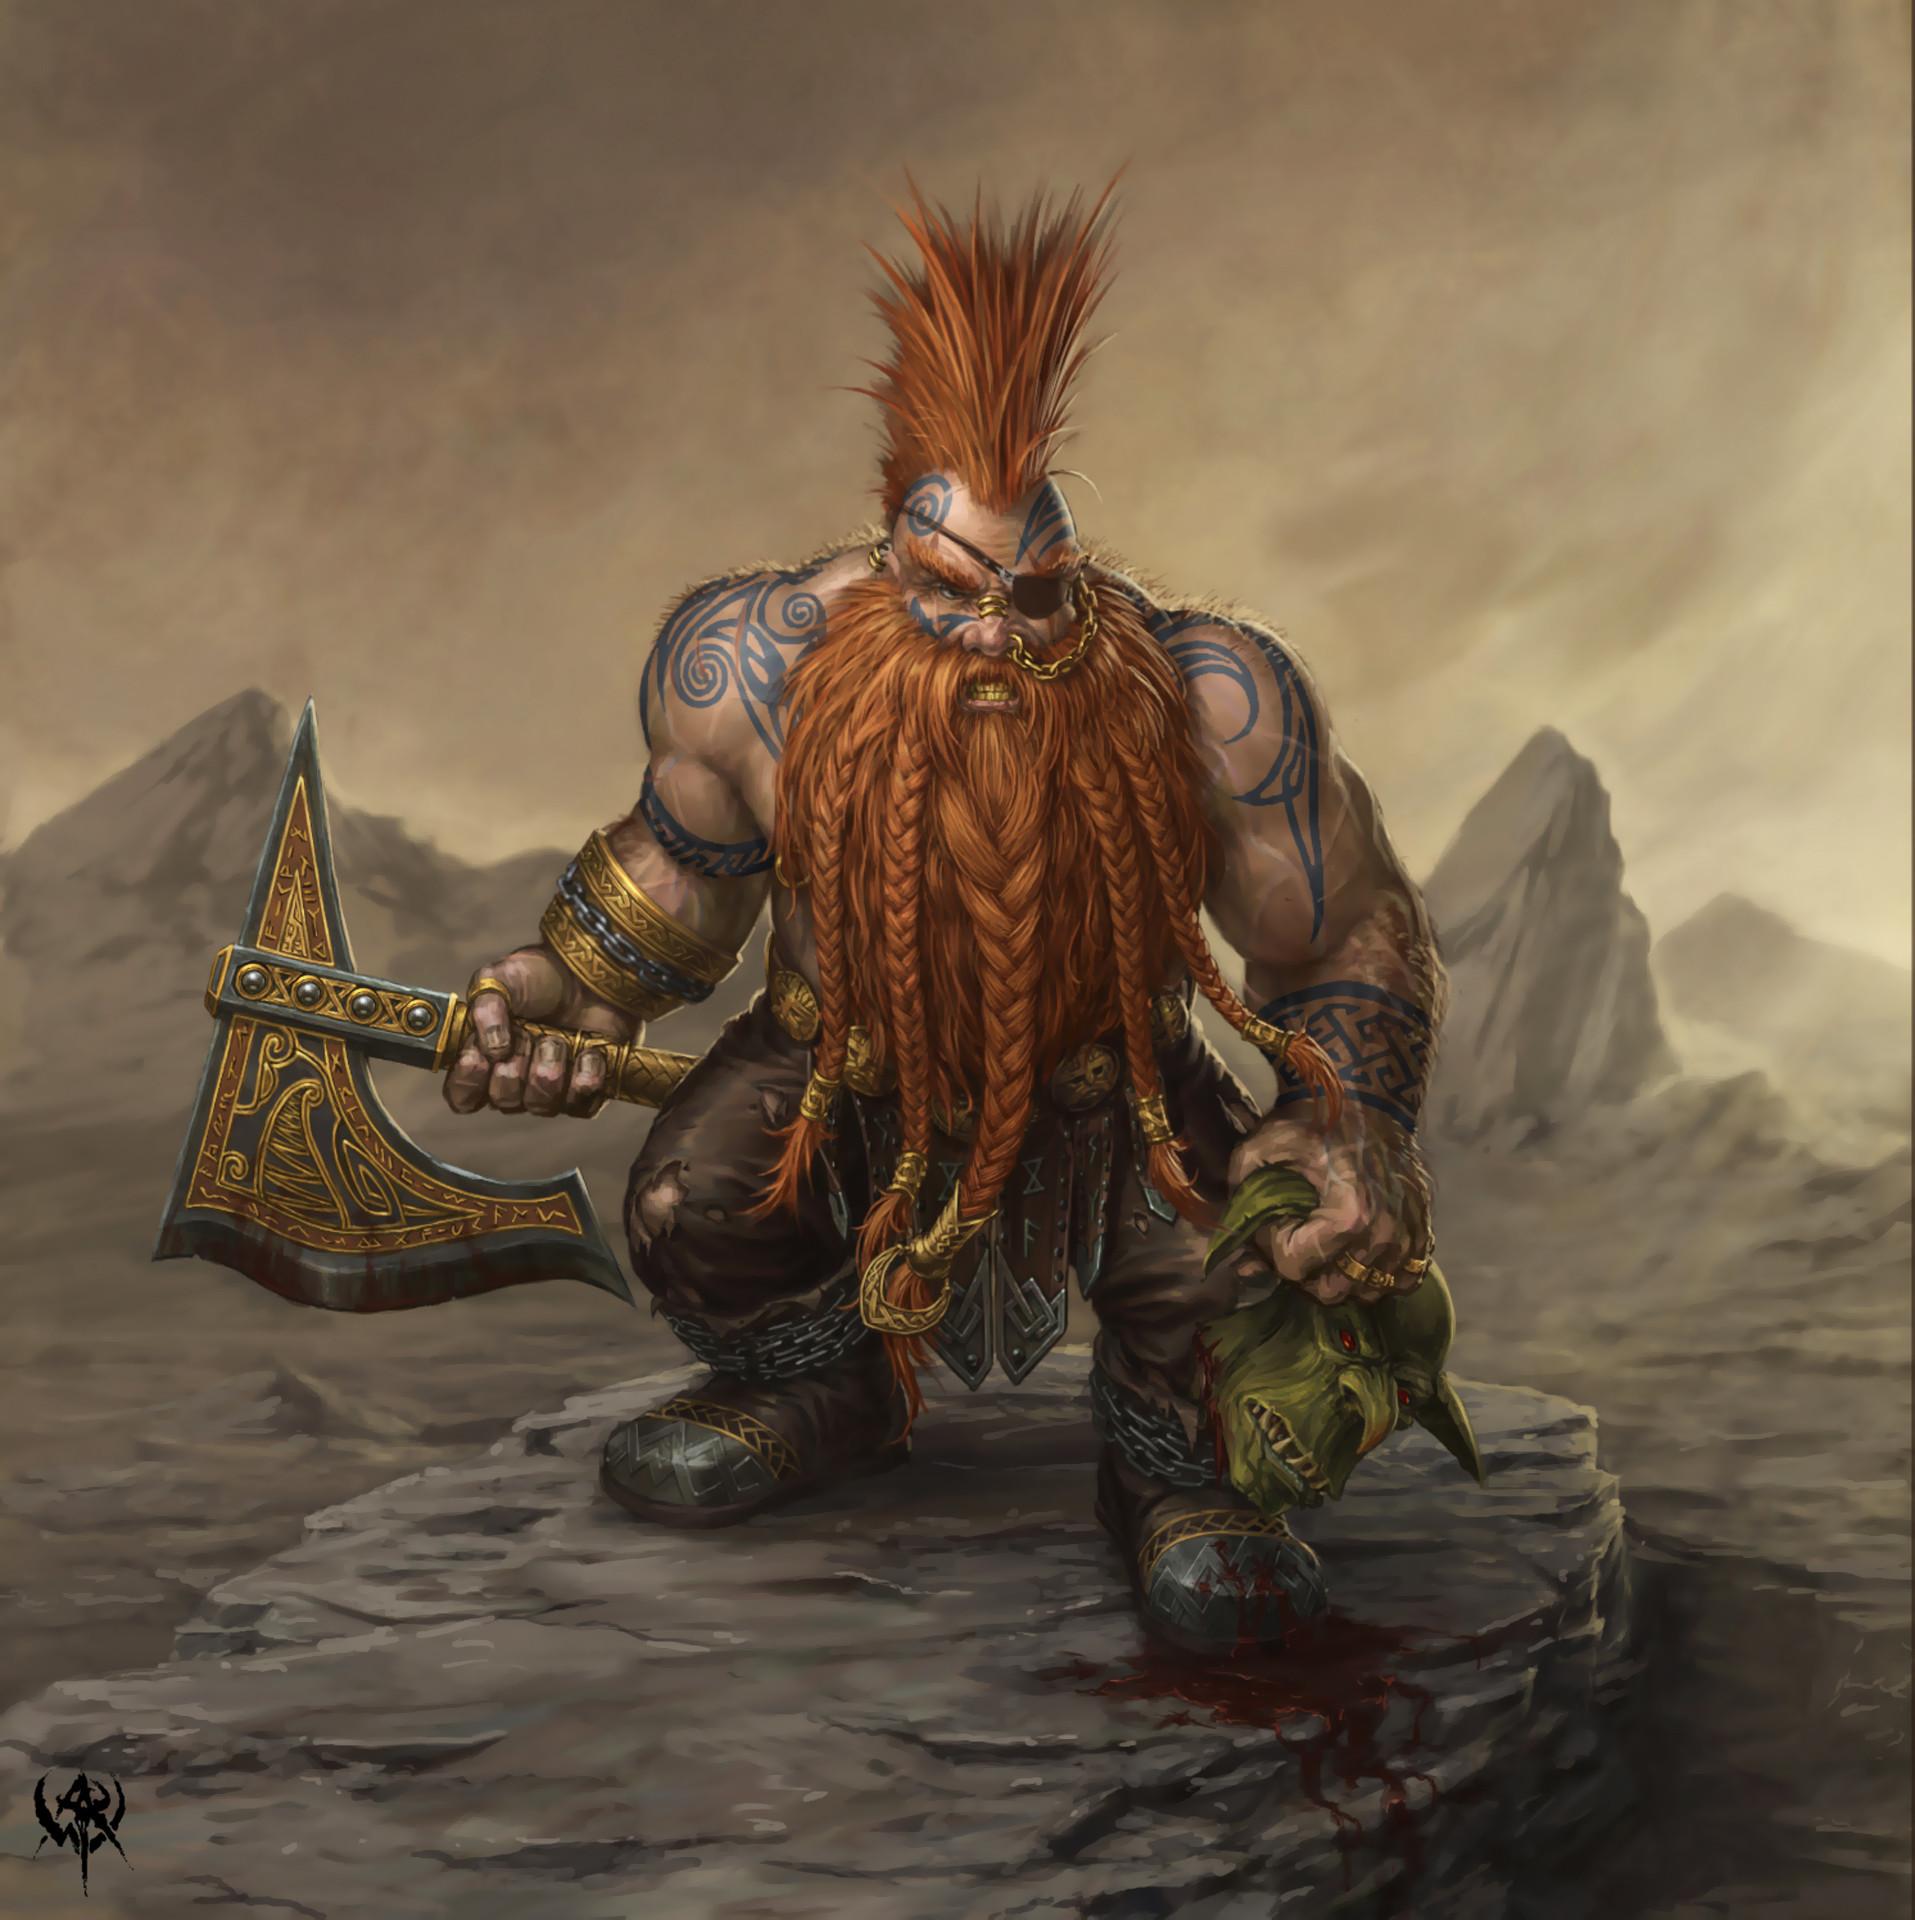 m Dwarf Barbarian axe Orc head rough magma volcano mountain mob dwarf  warrior by PabloQ